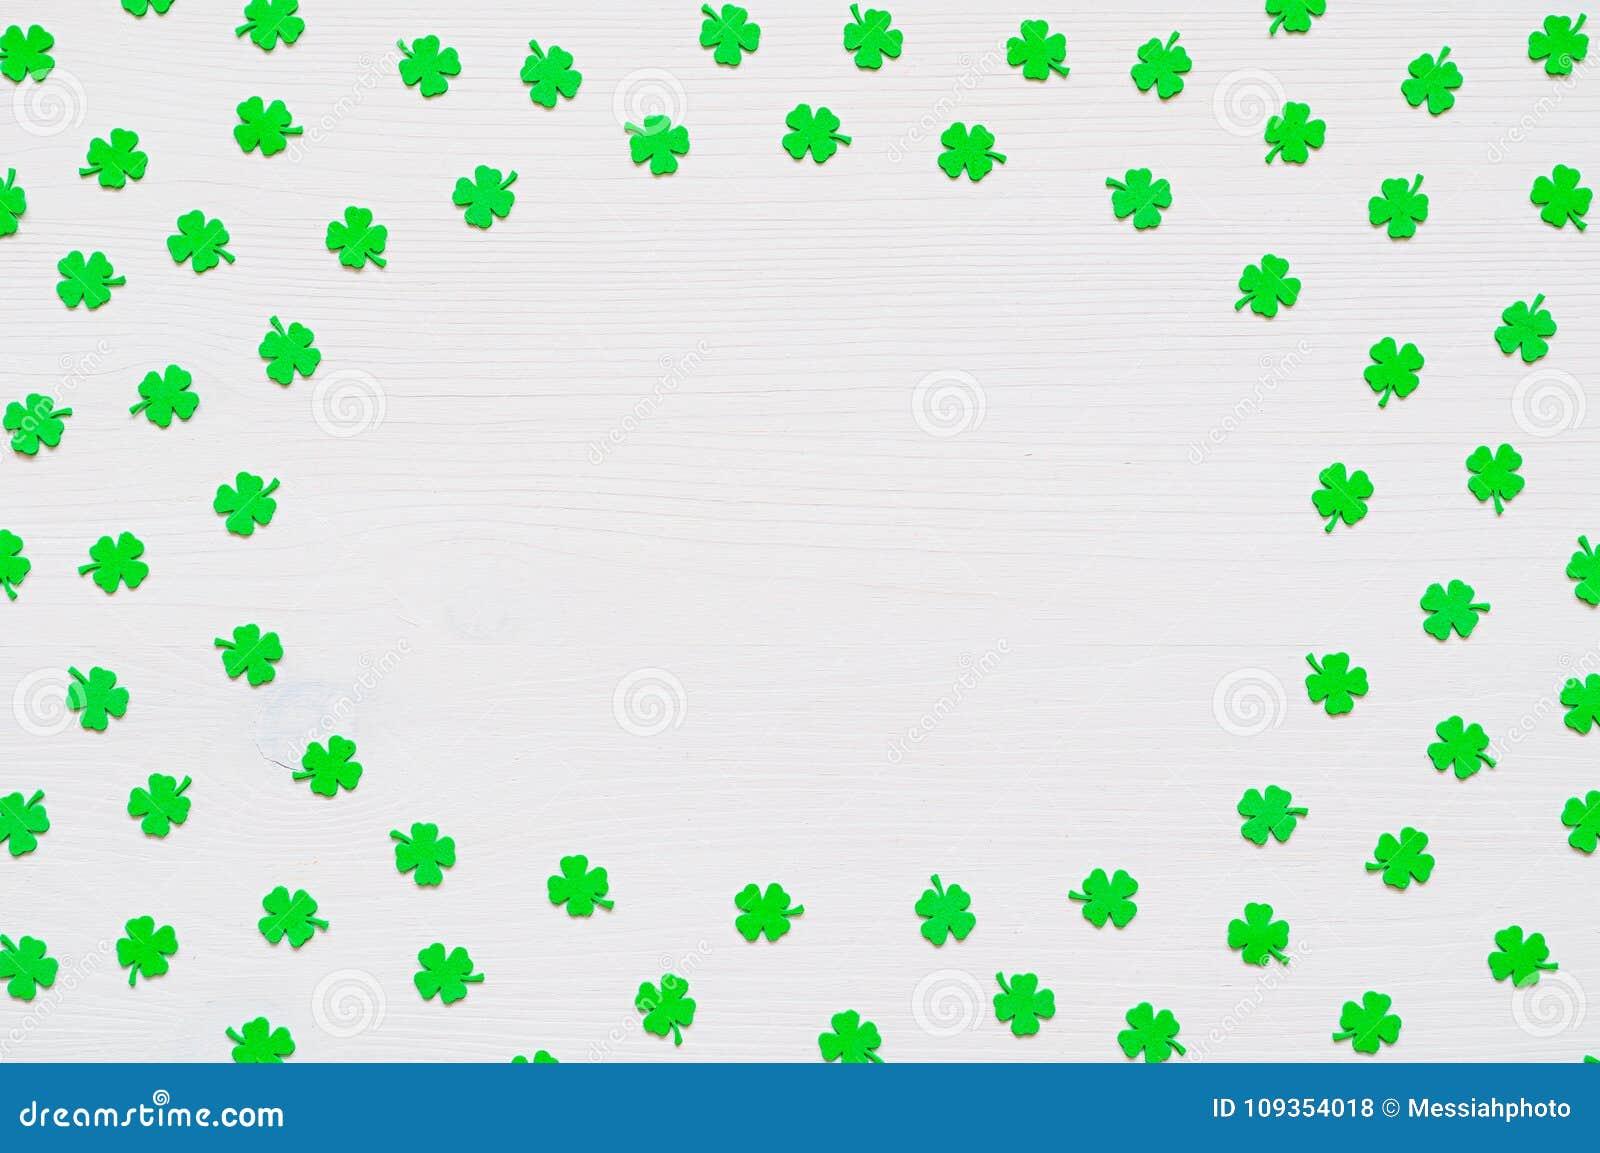 St Patrick`s Day background with green quatrefoils on white background, round border